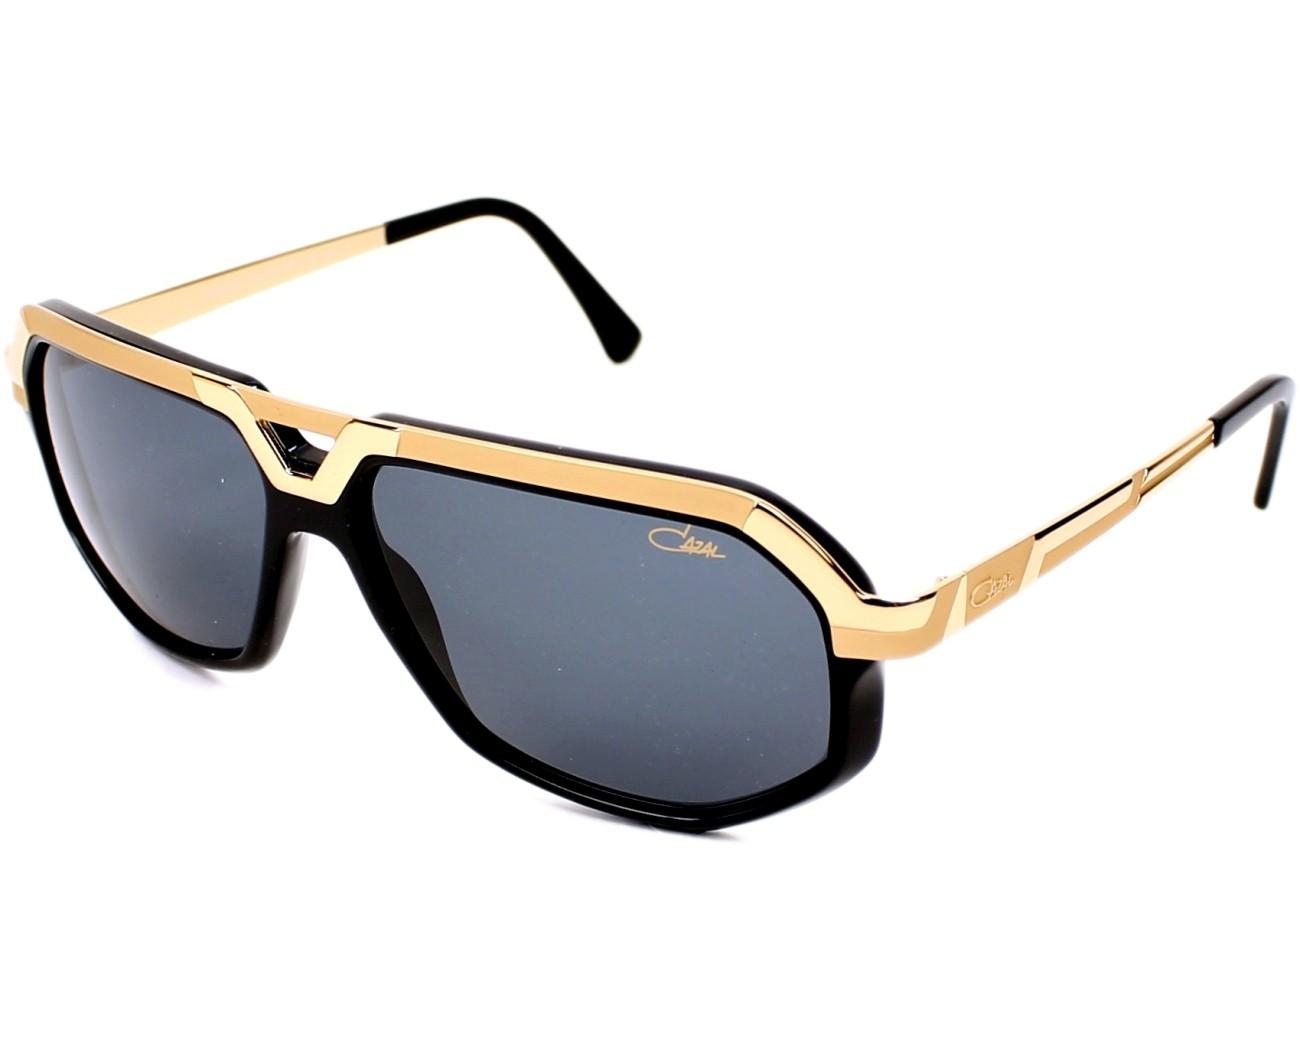 cazal sunglasses 8021 001 62 visionet. Black Bedroom Furniture Sets. Home Design Ideas